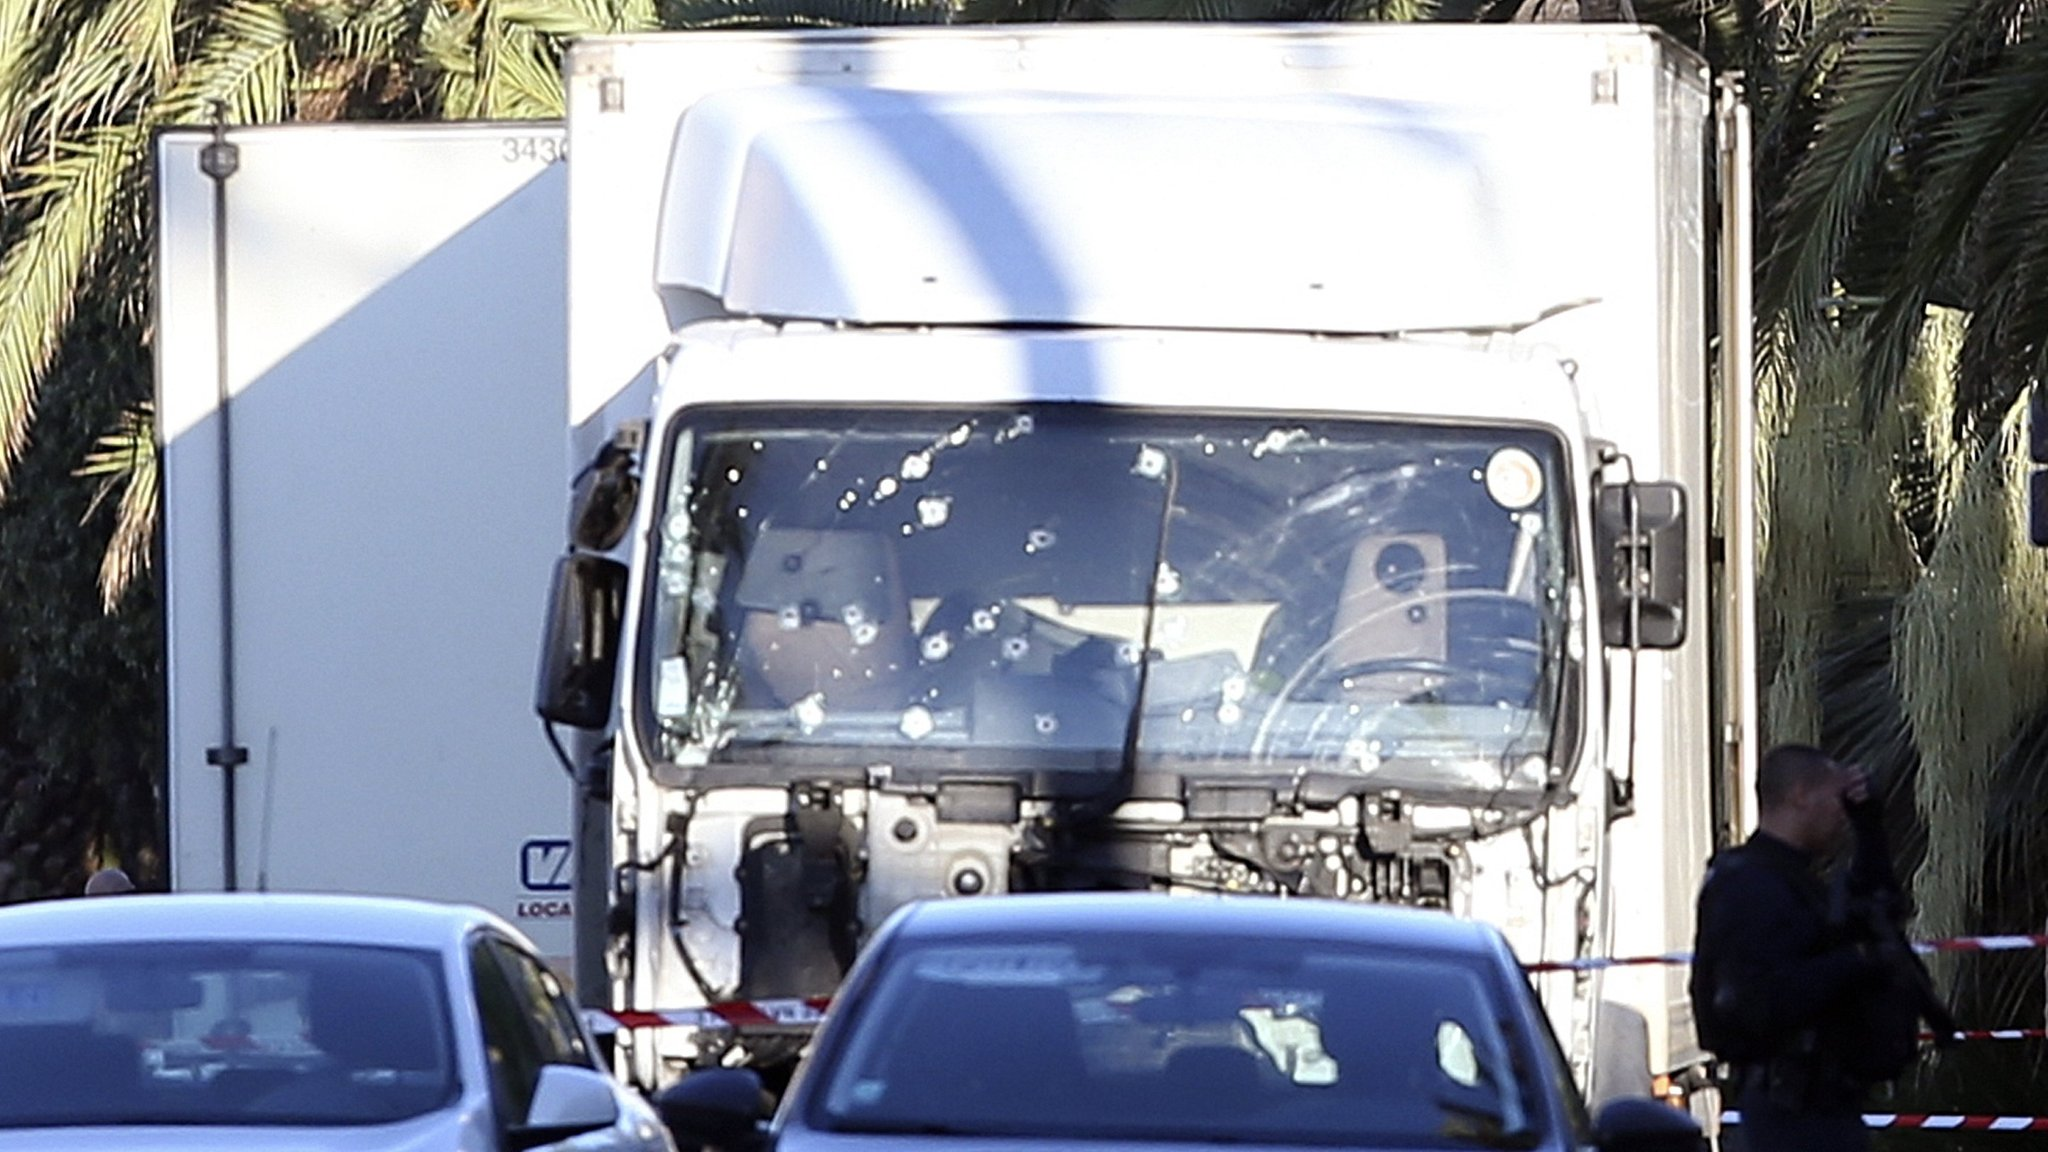 APTOPIX France Truck Attack